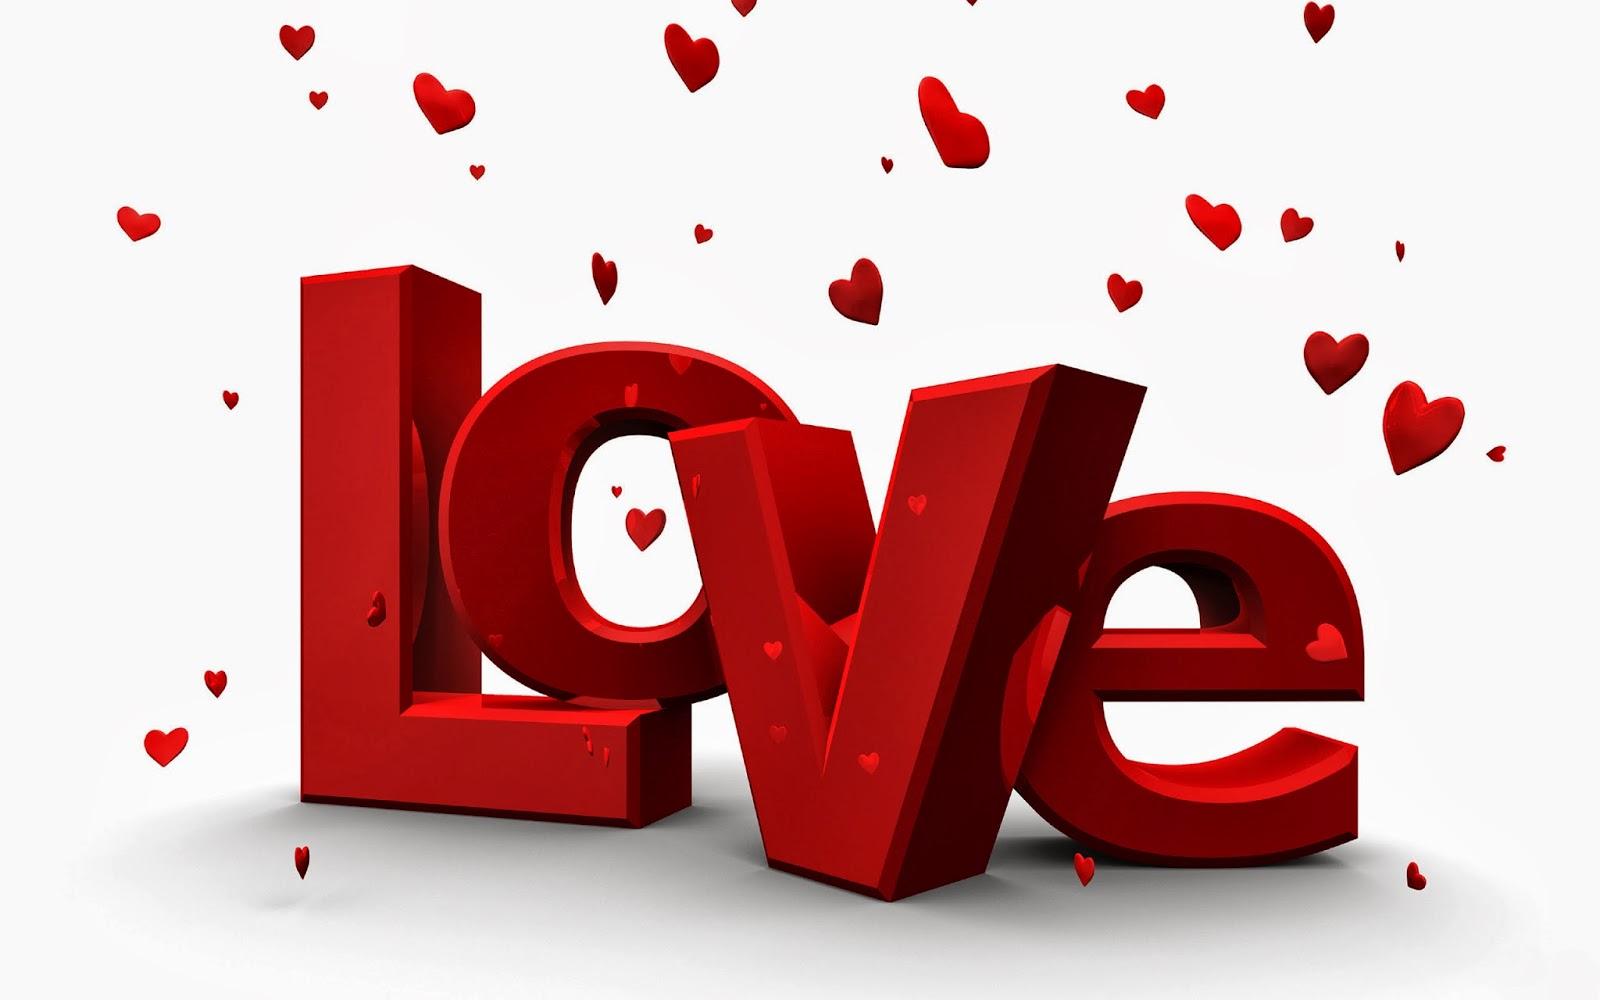 Fondos De Pantalla Animados De San Valentín: Fondo De Pantalla Dia De San Valentin Love Corazones Rojos